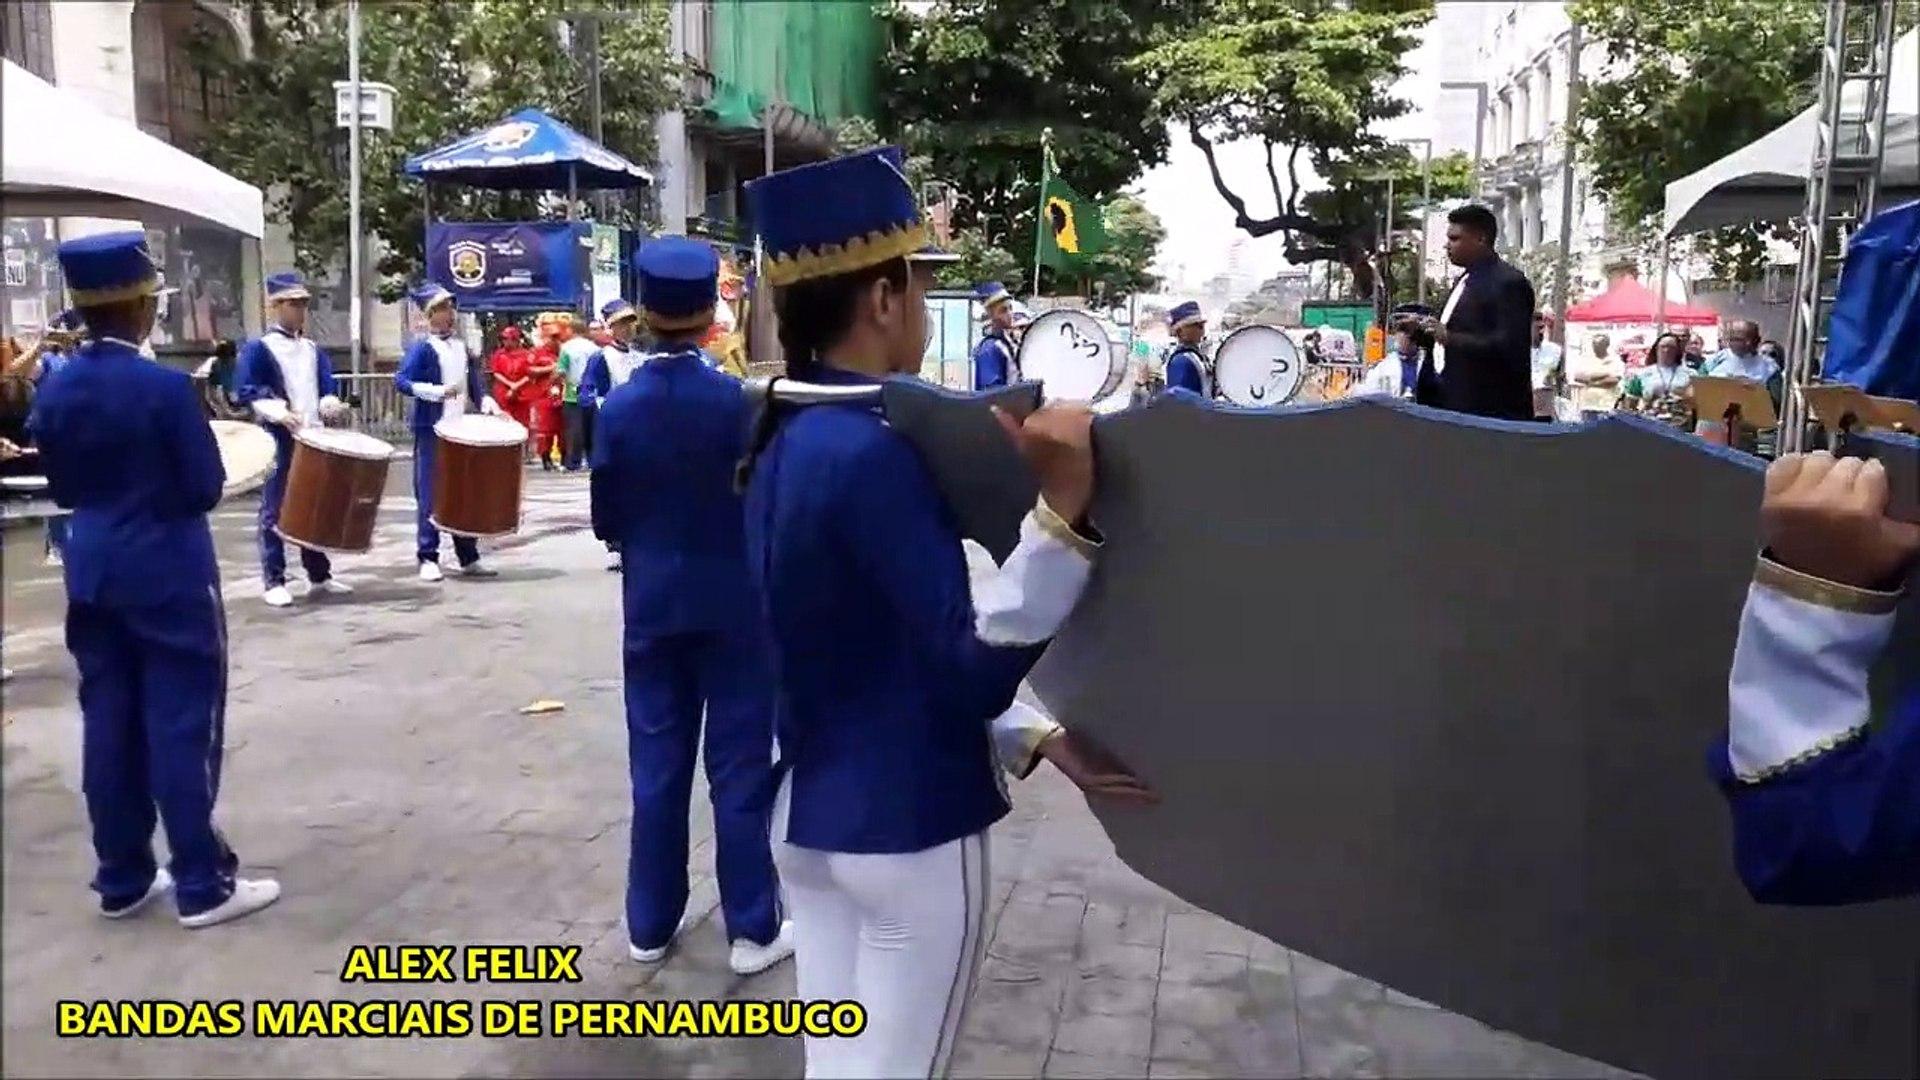 CNBF - 2018 _ Banda de Percussão Gricon e Silva - CAMPEONATO NACIONAL DE BANDAS E FANFARRAS - RECIFE